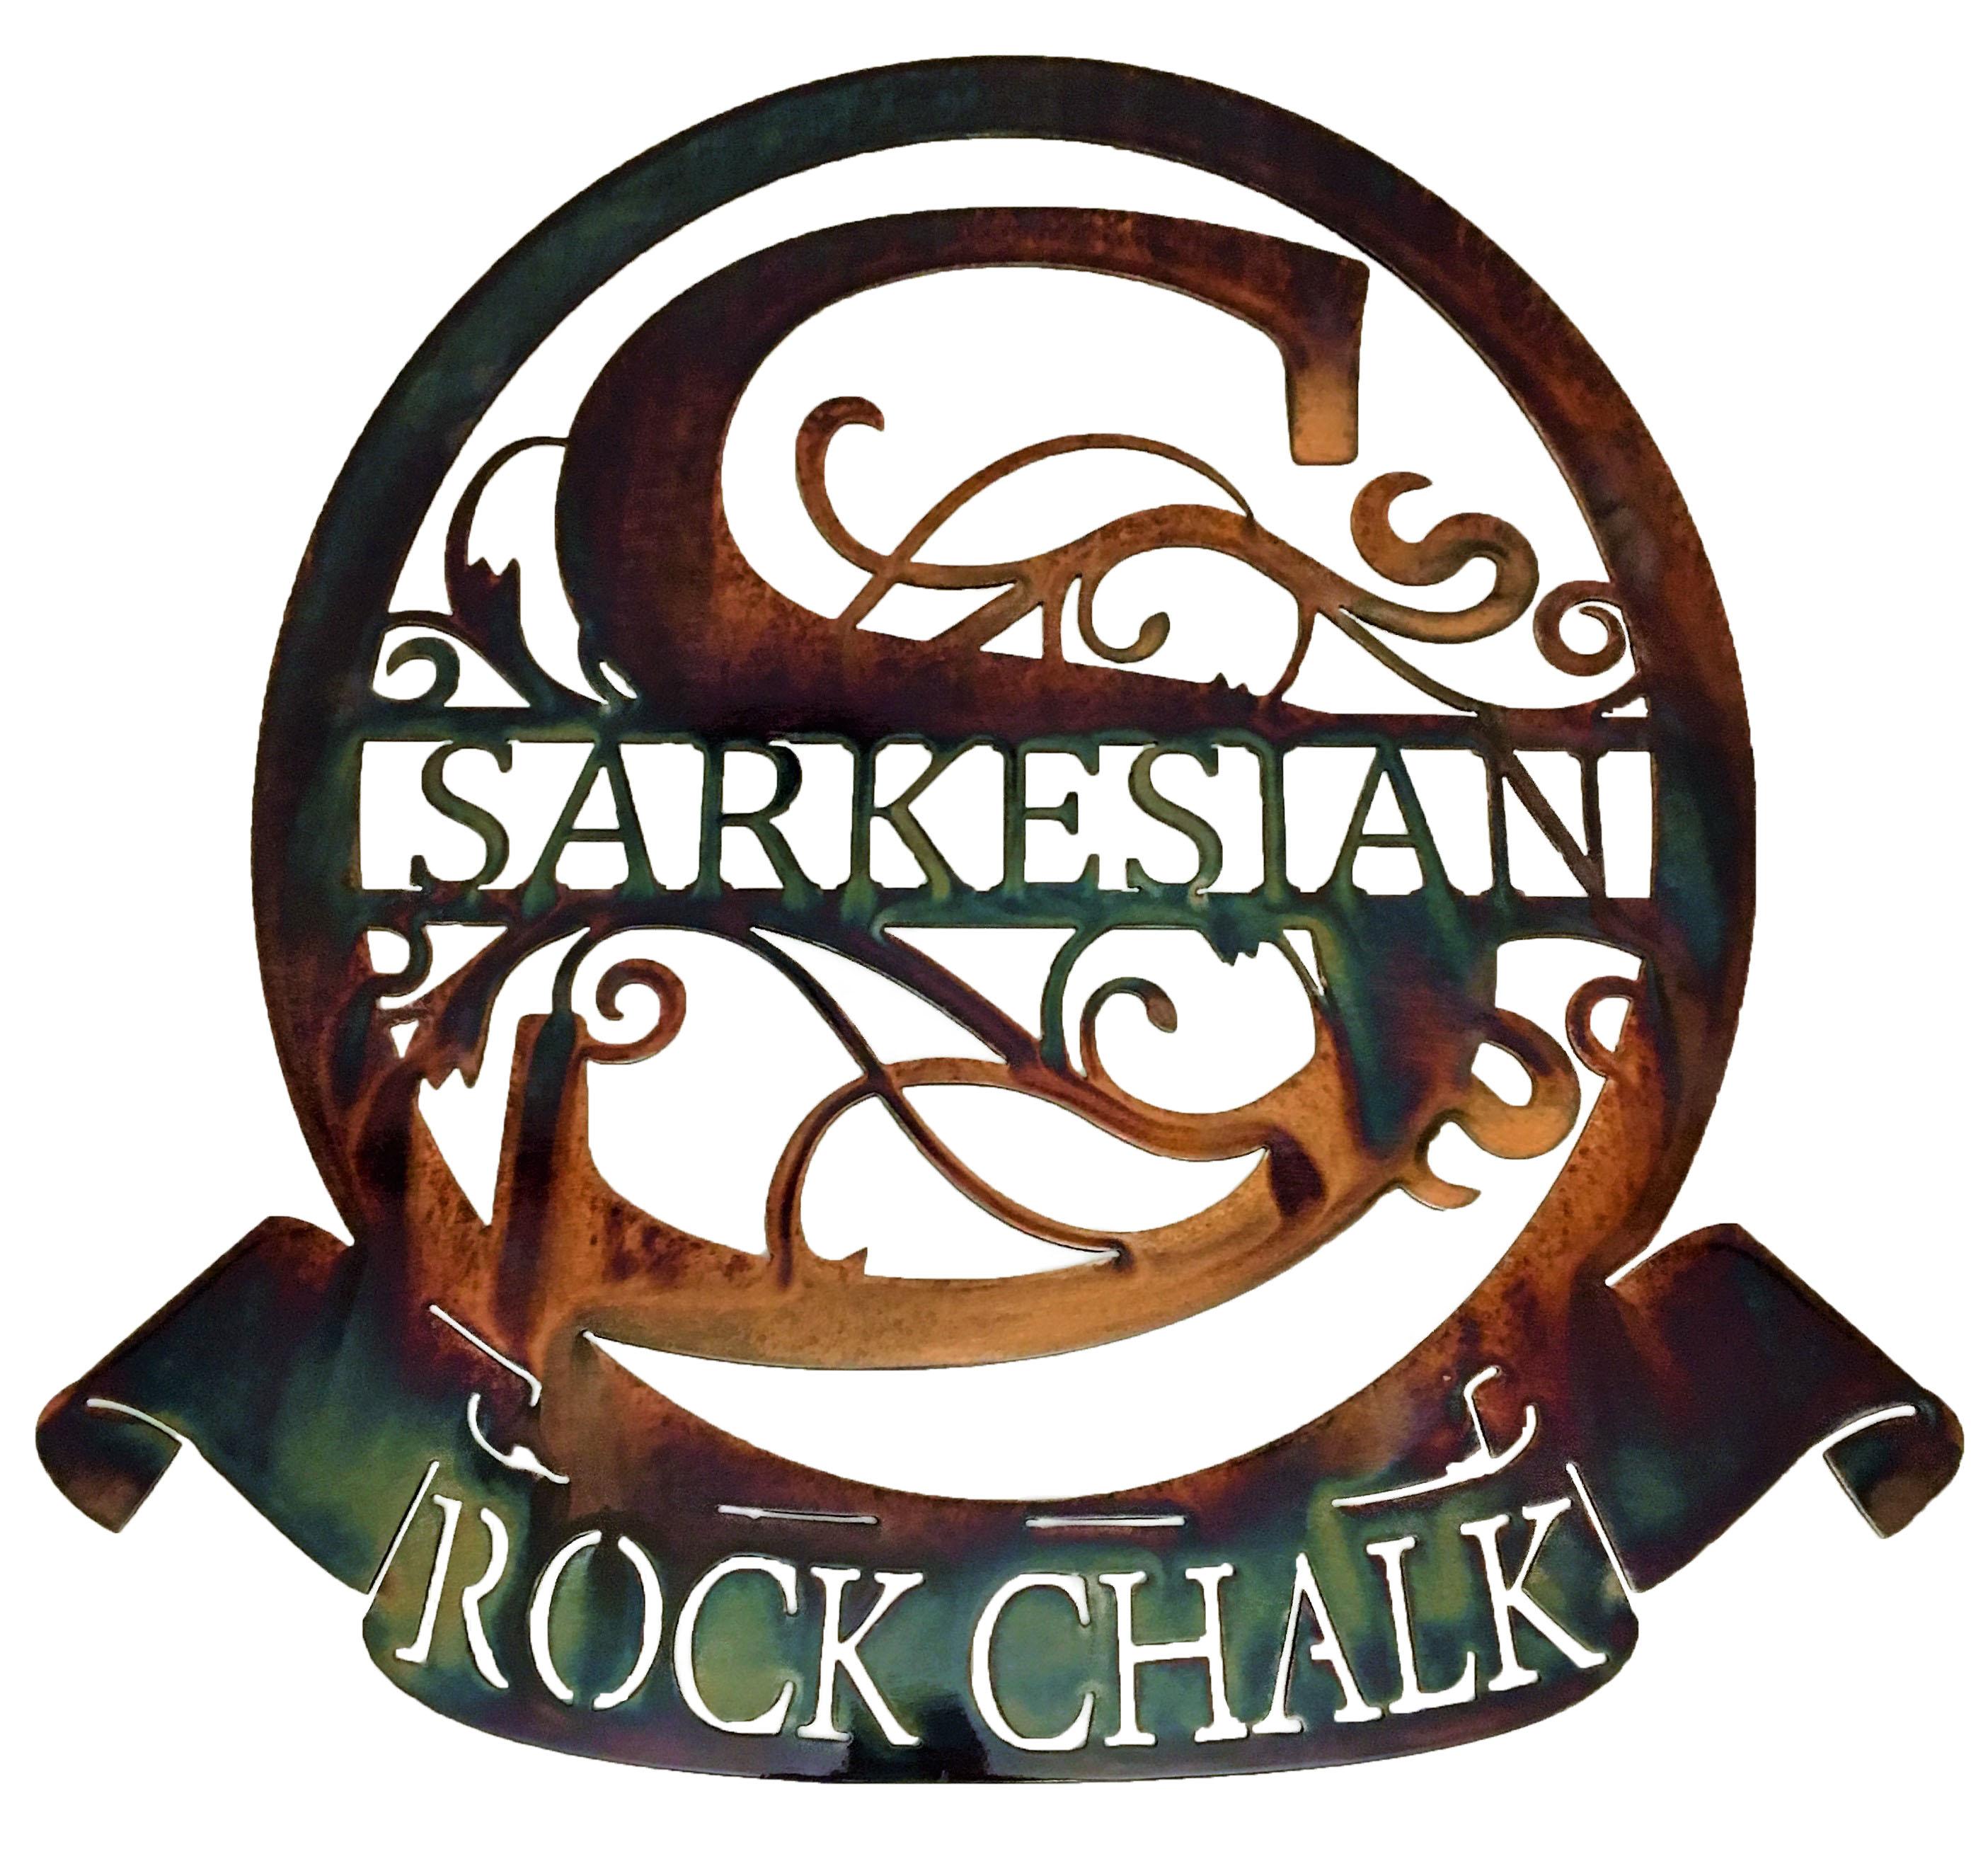 Sarkesian Monogram_RockChalk_AuburnPrism